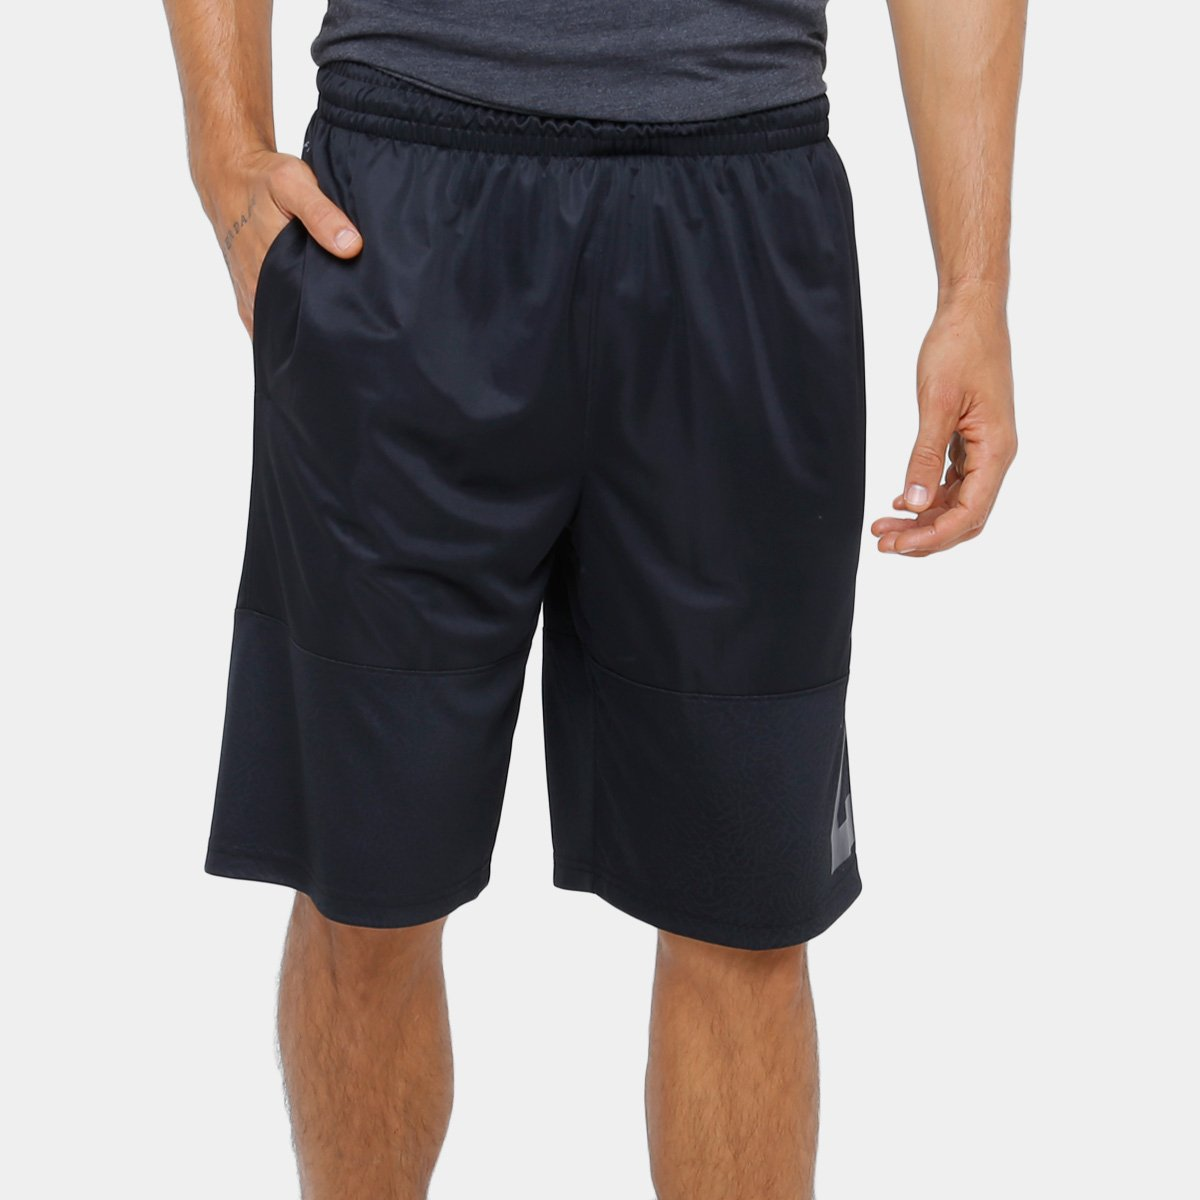 85c1f4a276978 Bermuda Jordan Nike Rise Twentythree Masculina - Compre Agora